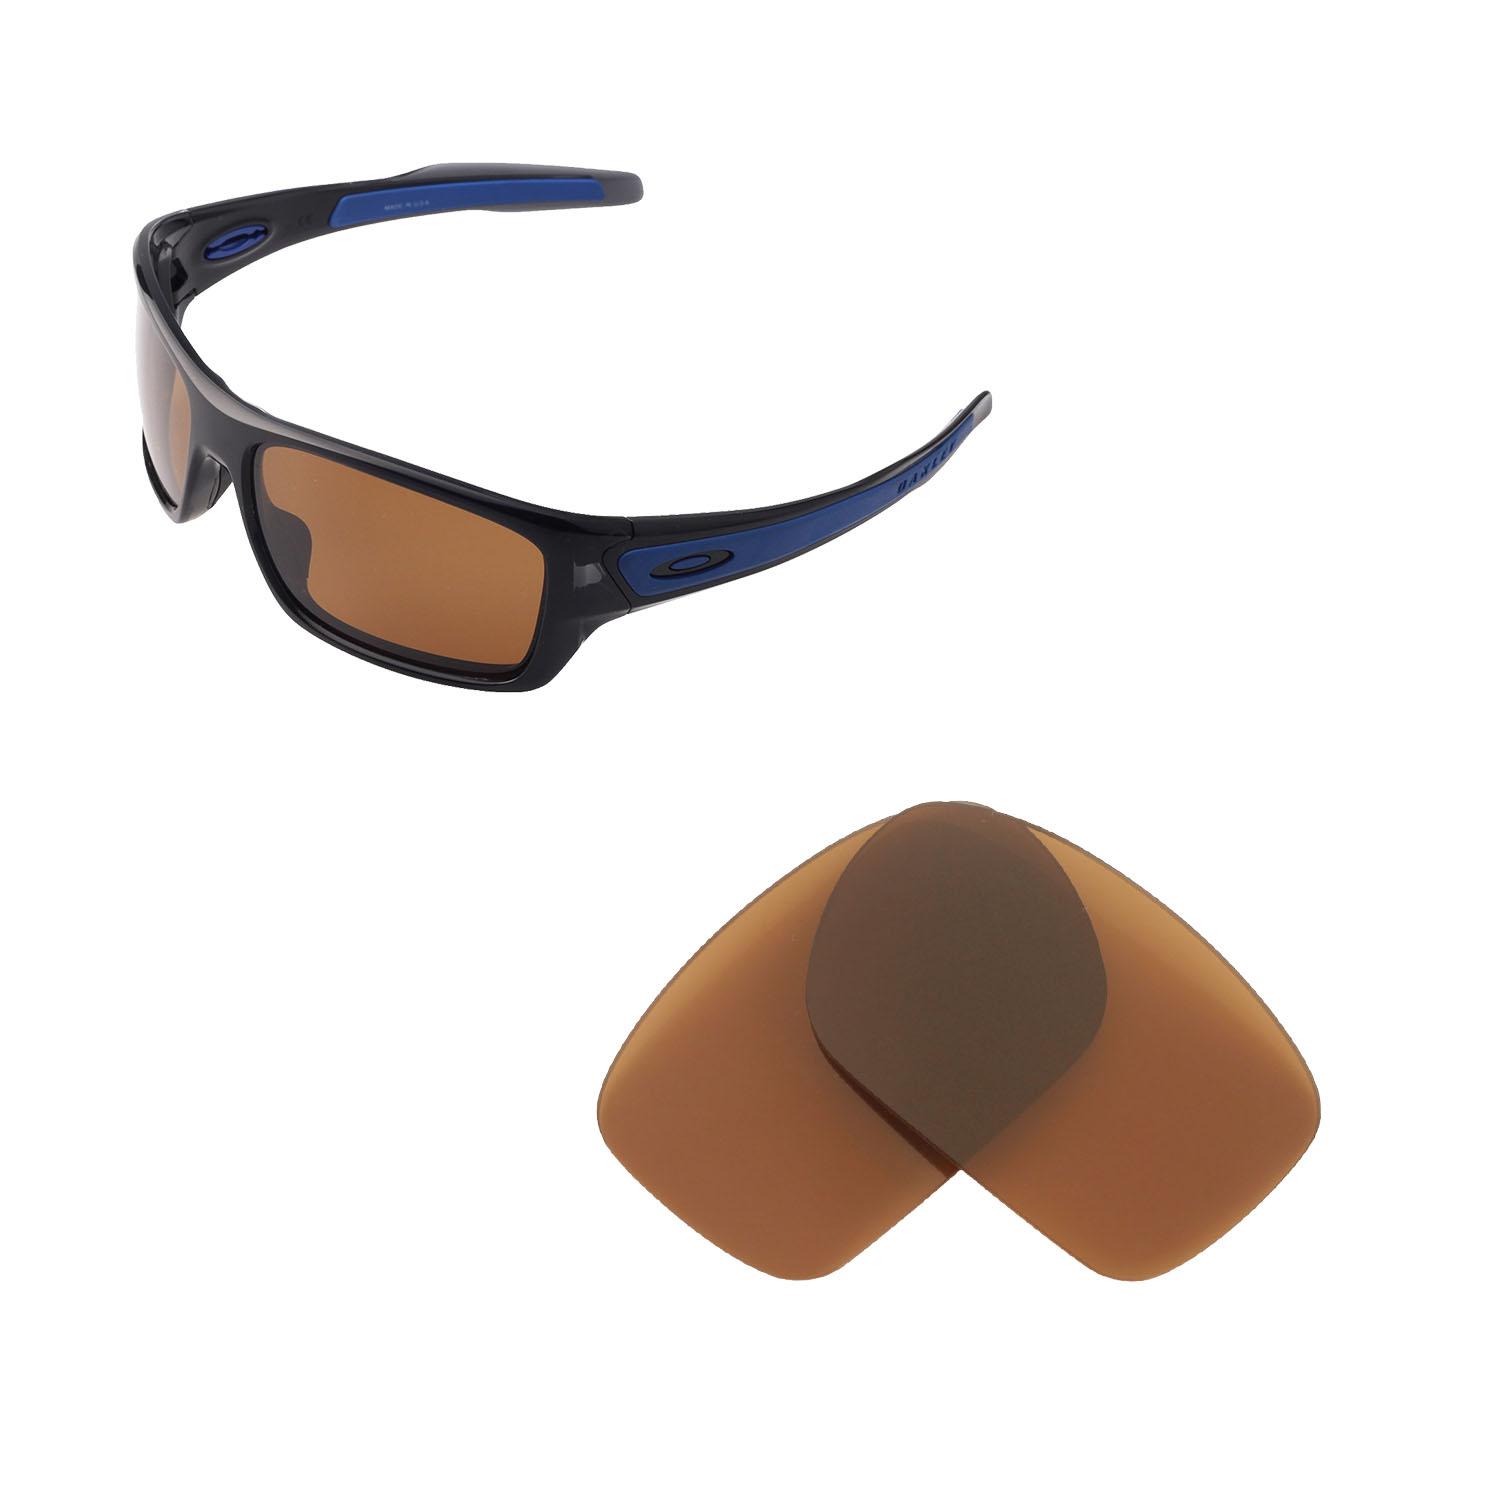 422c97f6c72 Walleva Replacement Lenses for Oakley Turbine Sunglasses-Multiple ...